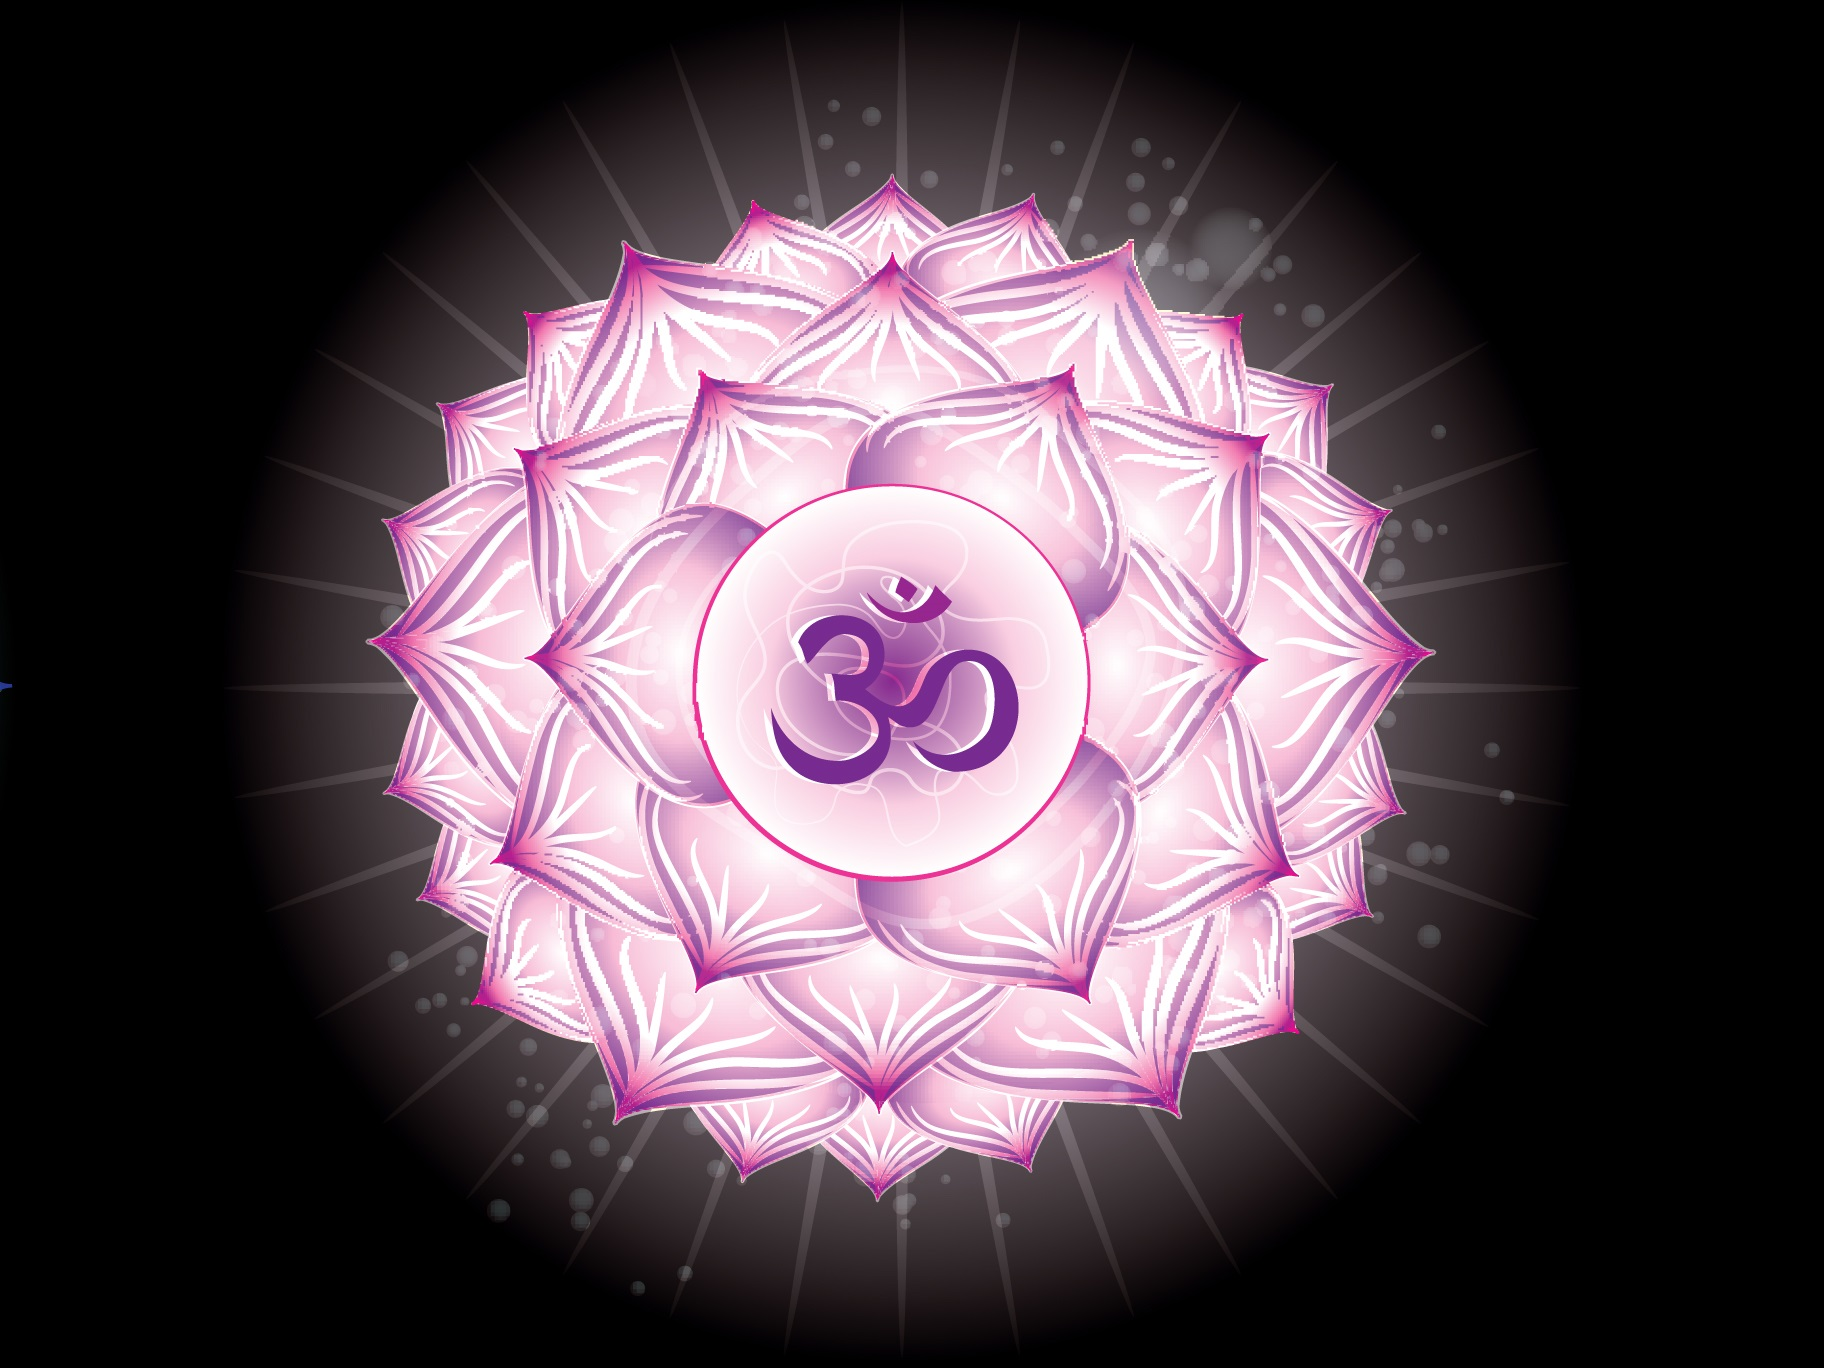 Бхакти-йога, Суть йоги, Джнана-йога,